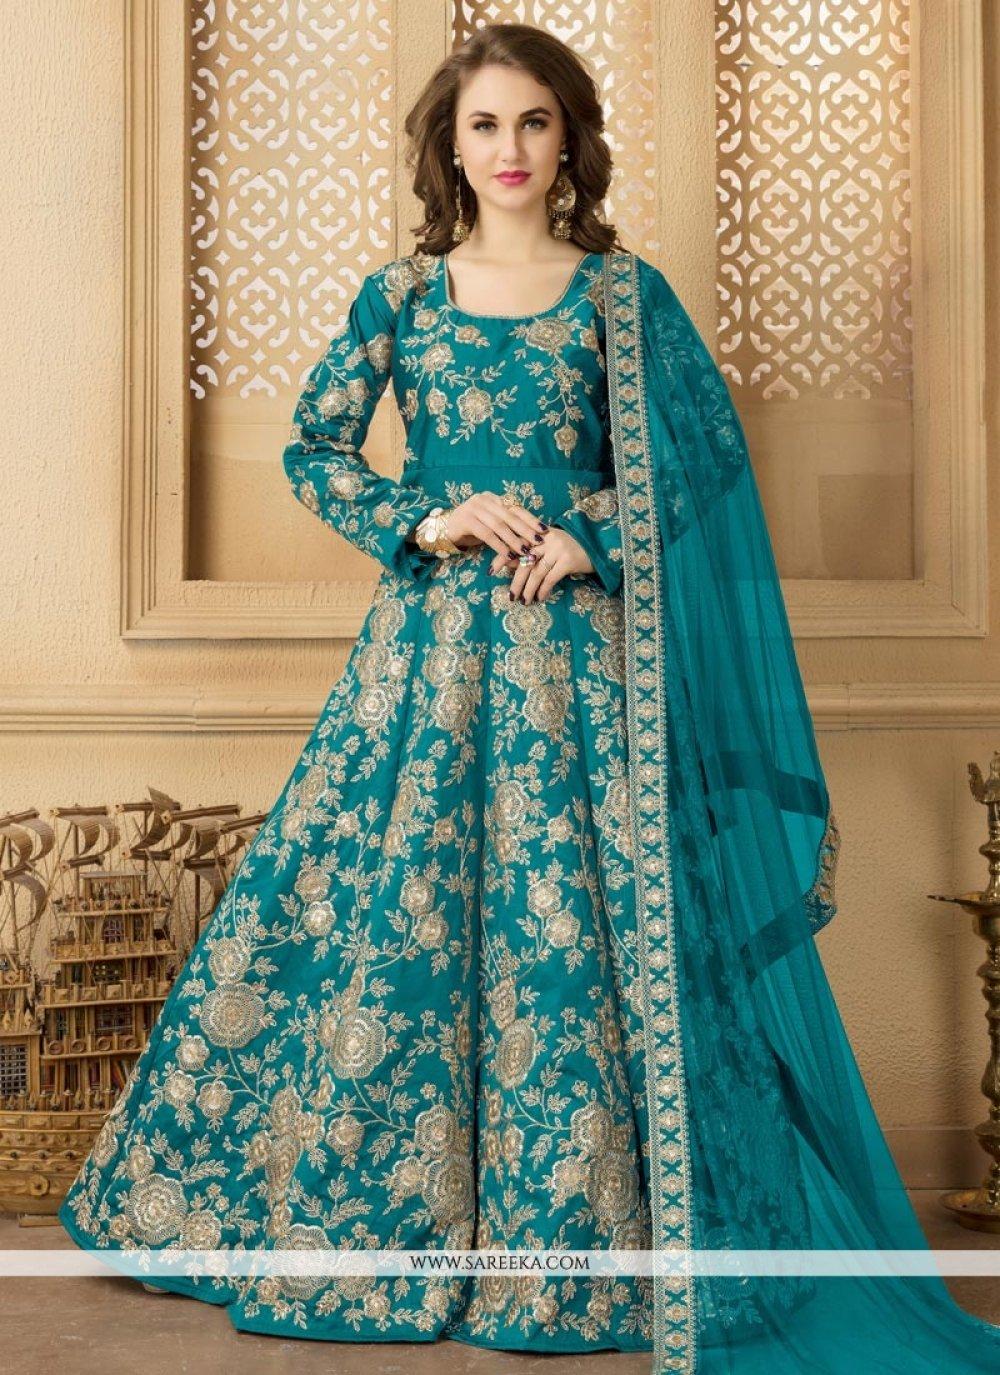 Teal Tafeta silk Floor Length Anarkali Suit